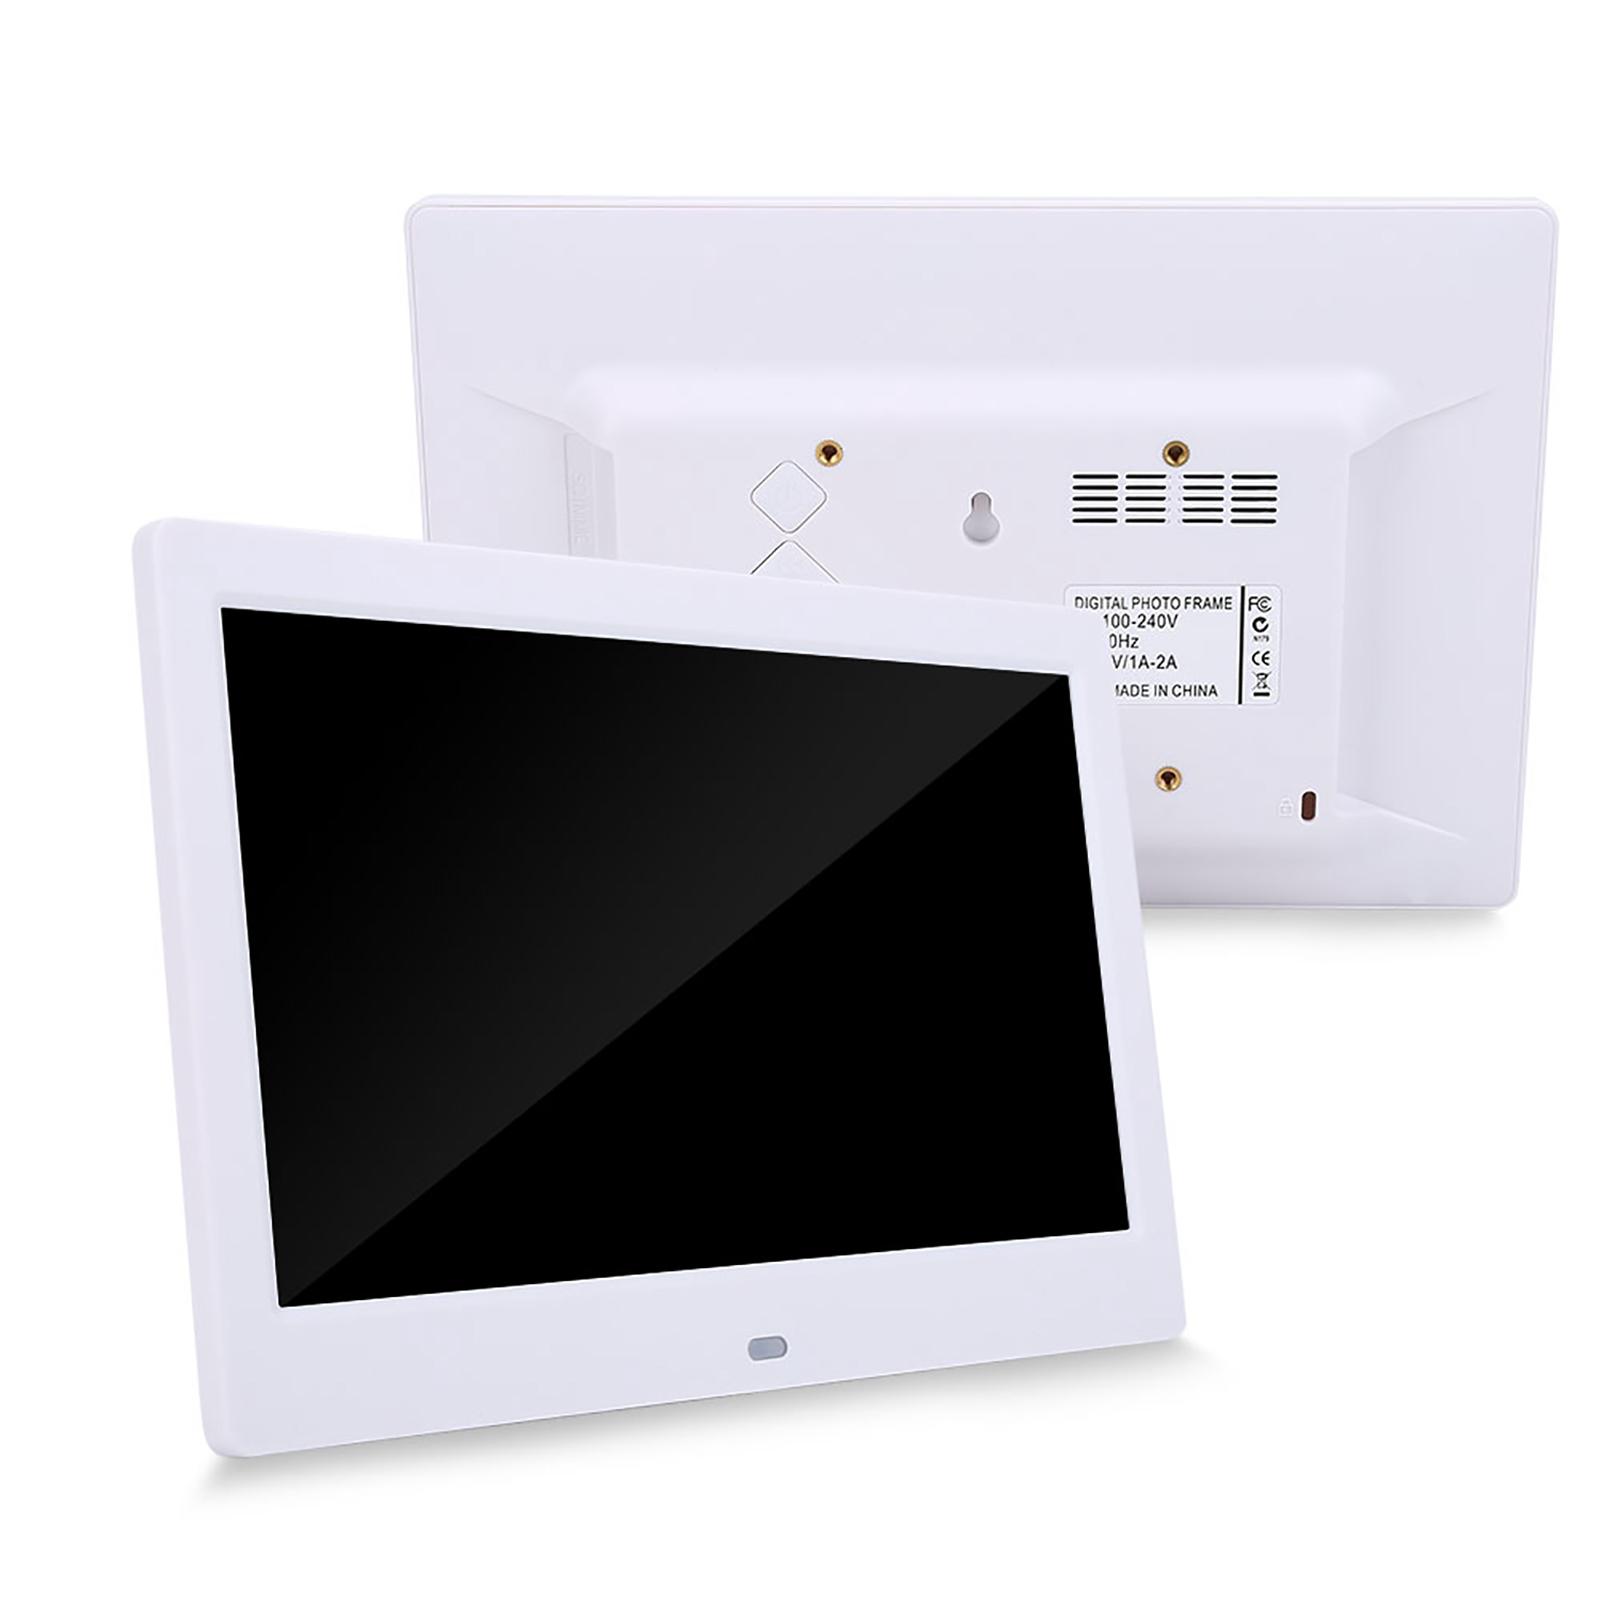 10 hd touchscreen digital bilderrahmen photo frame kalender mp3 film player bs ebay. Black Bedroom Furniture Sets. Home Design Ideas